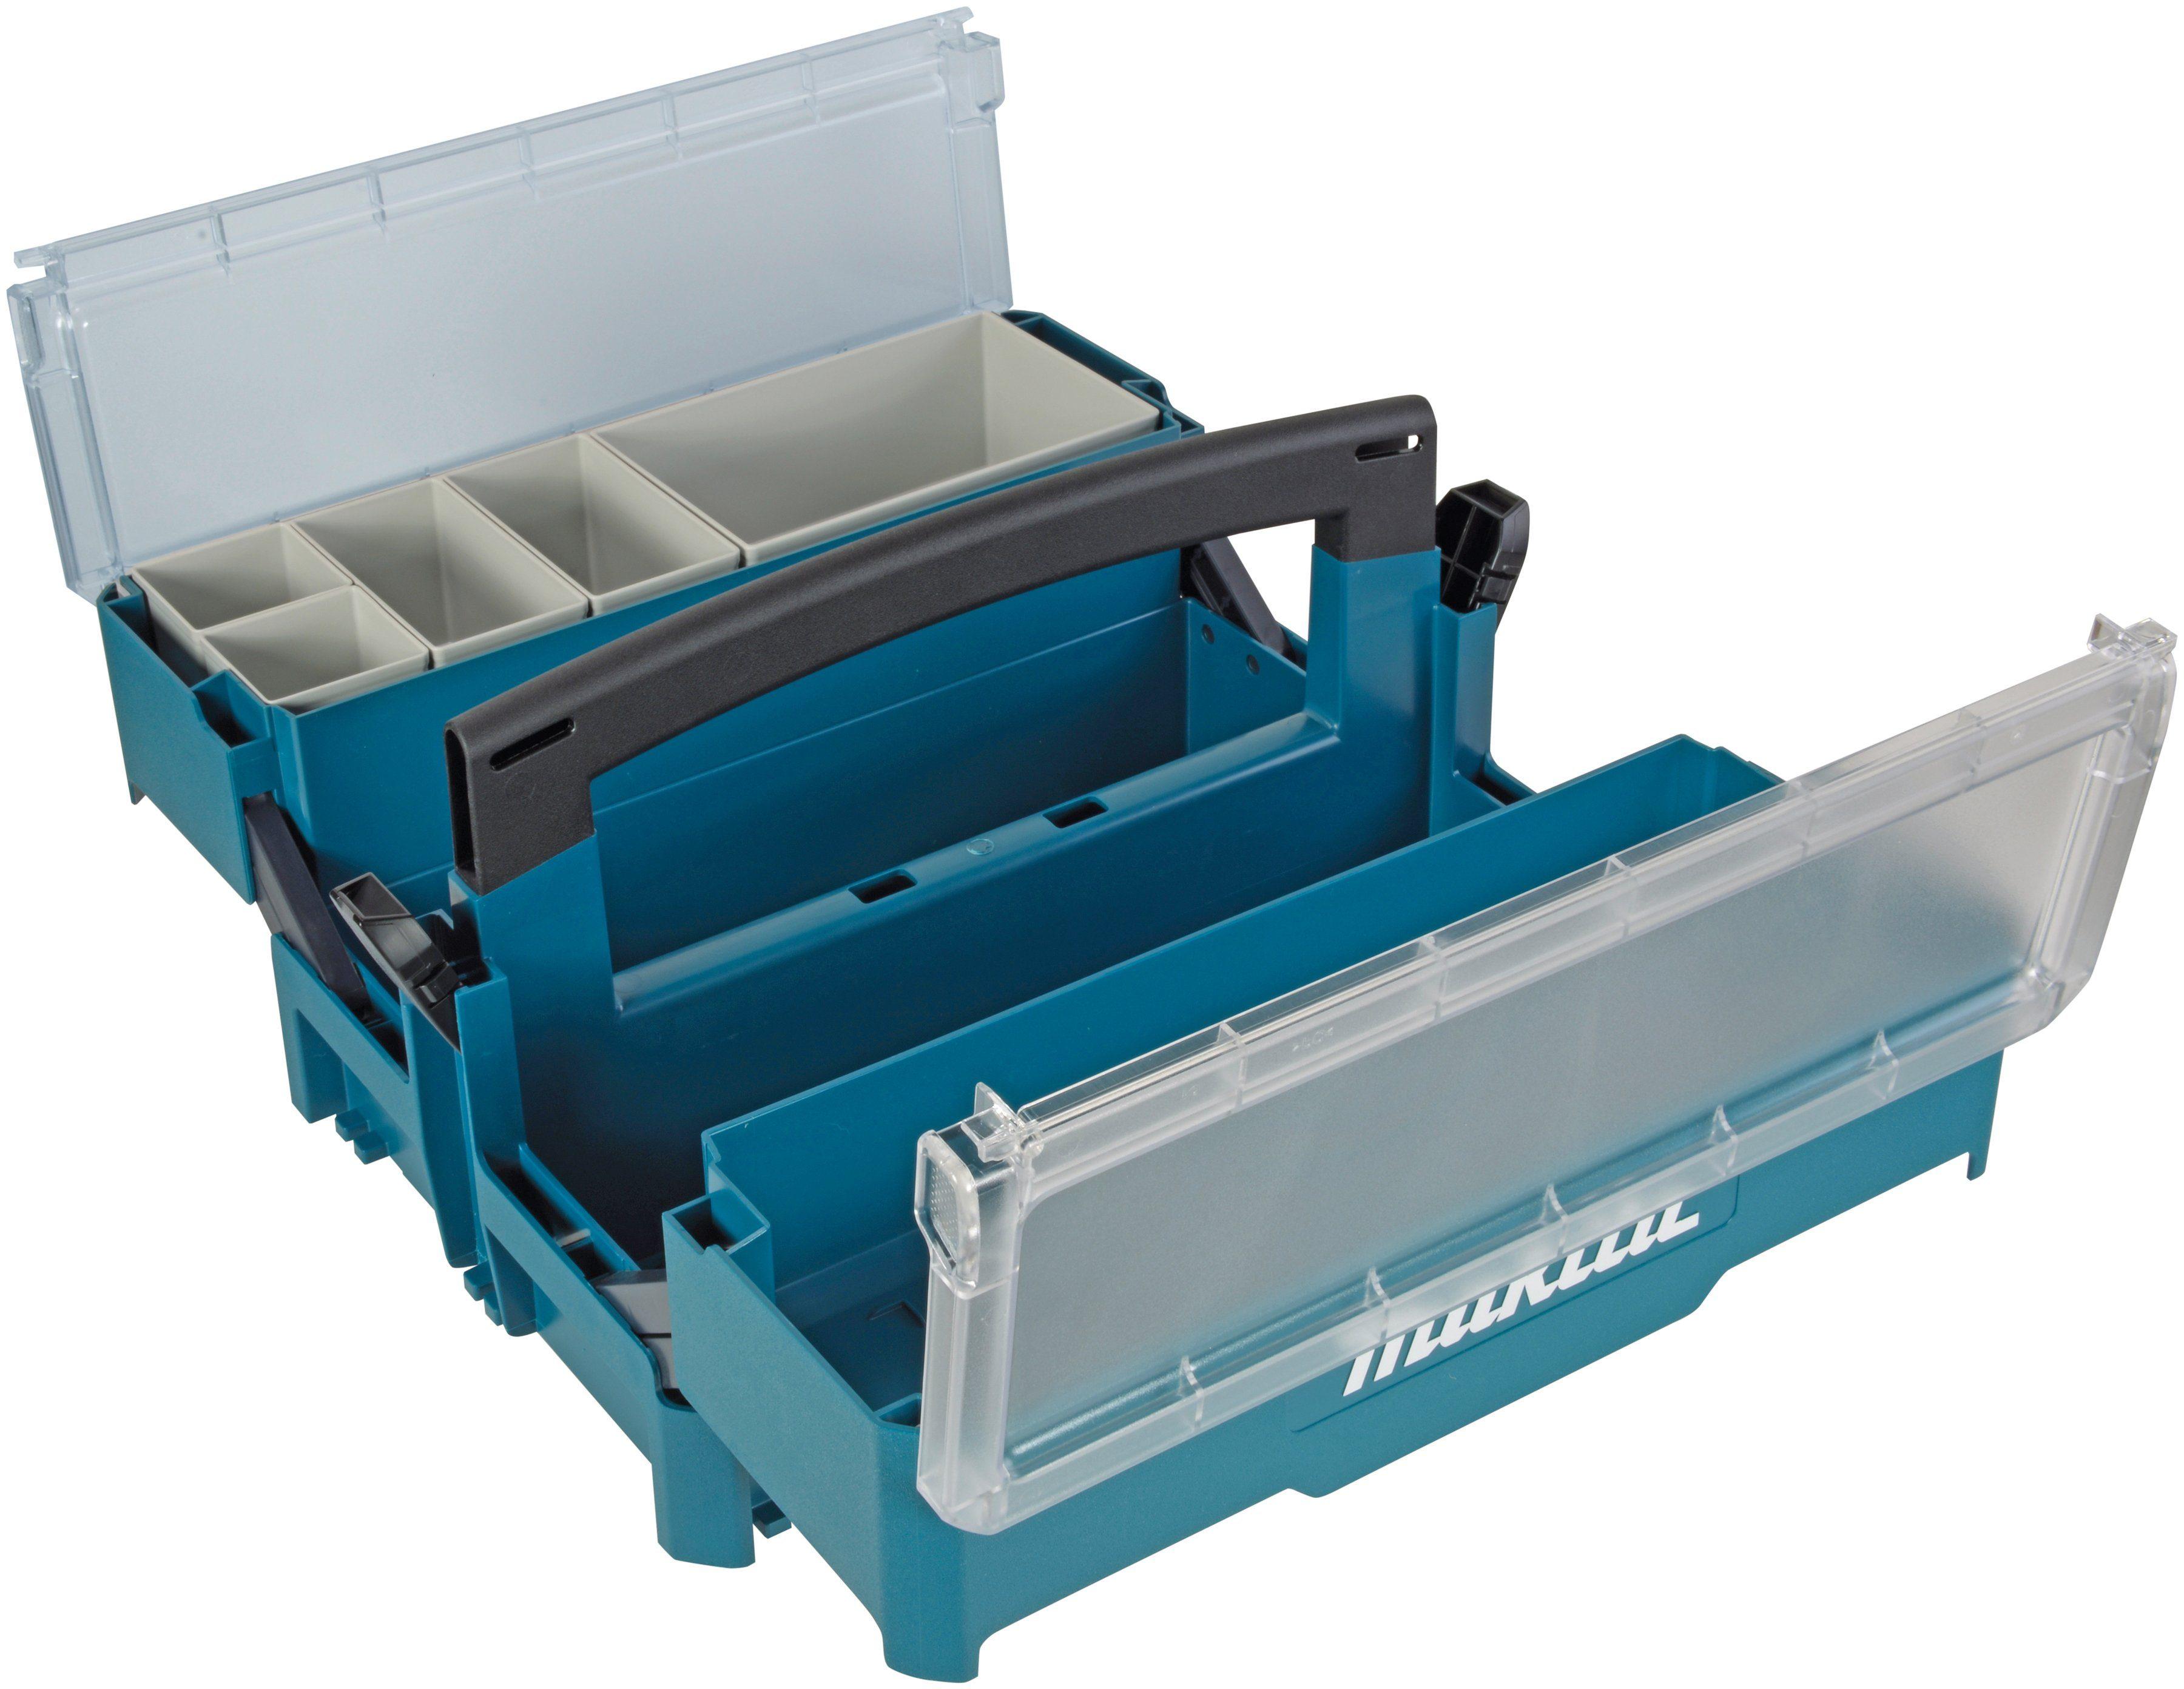 MAKITA Werkzeugkoffer »P-84137«, leer, 395 x 295 x 233 mm